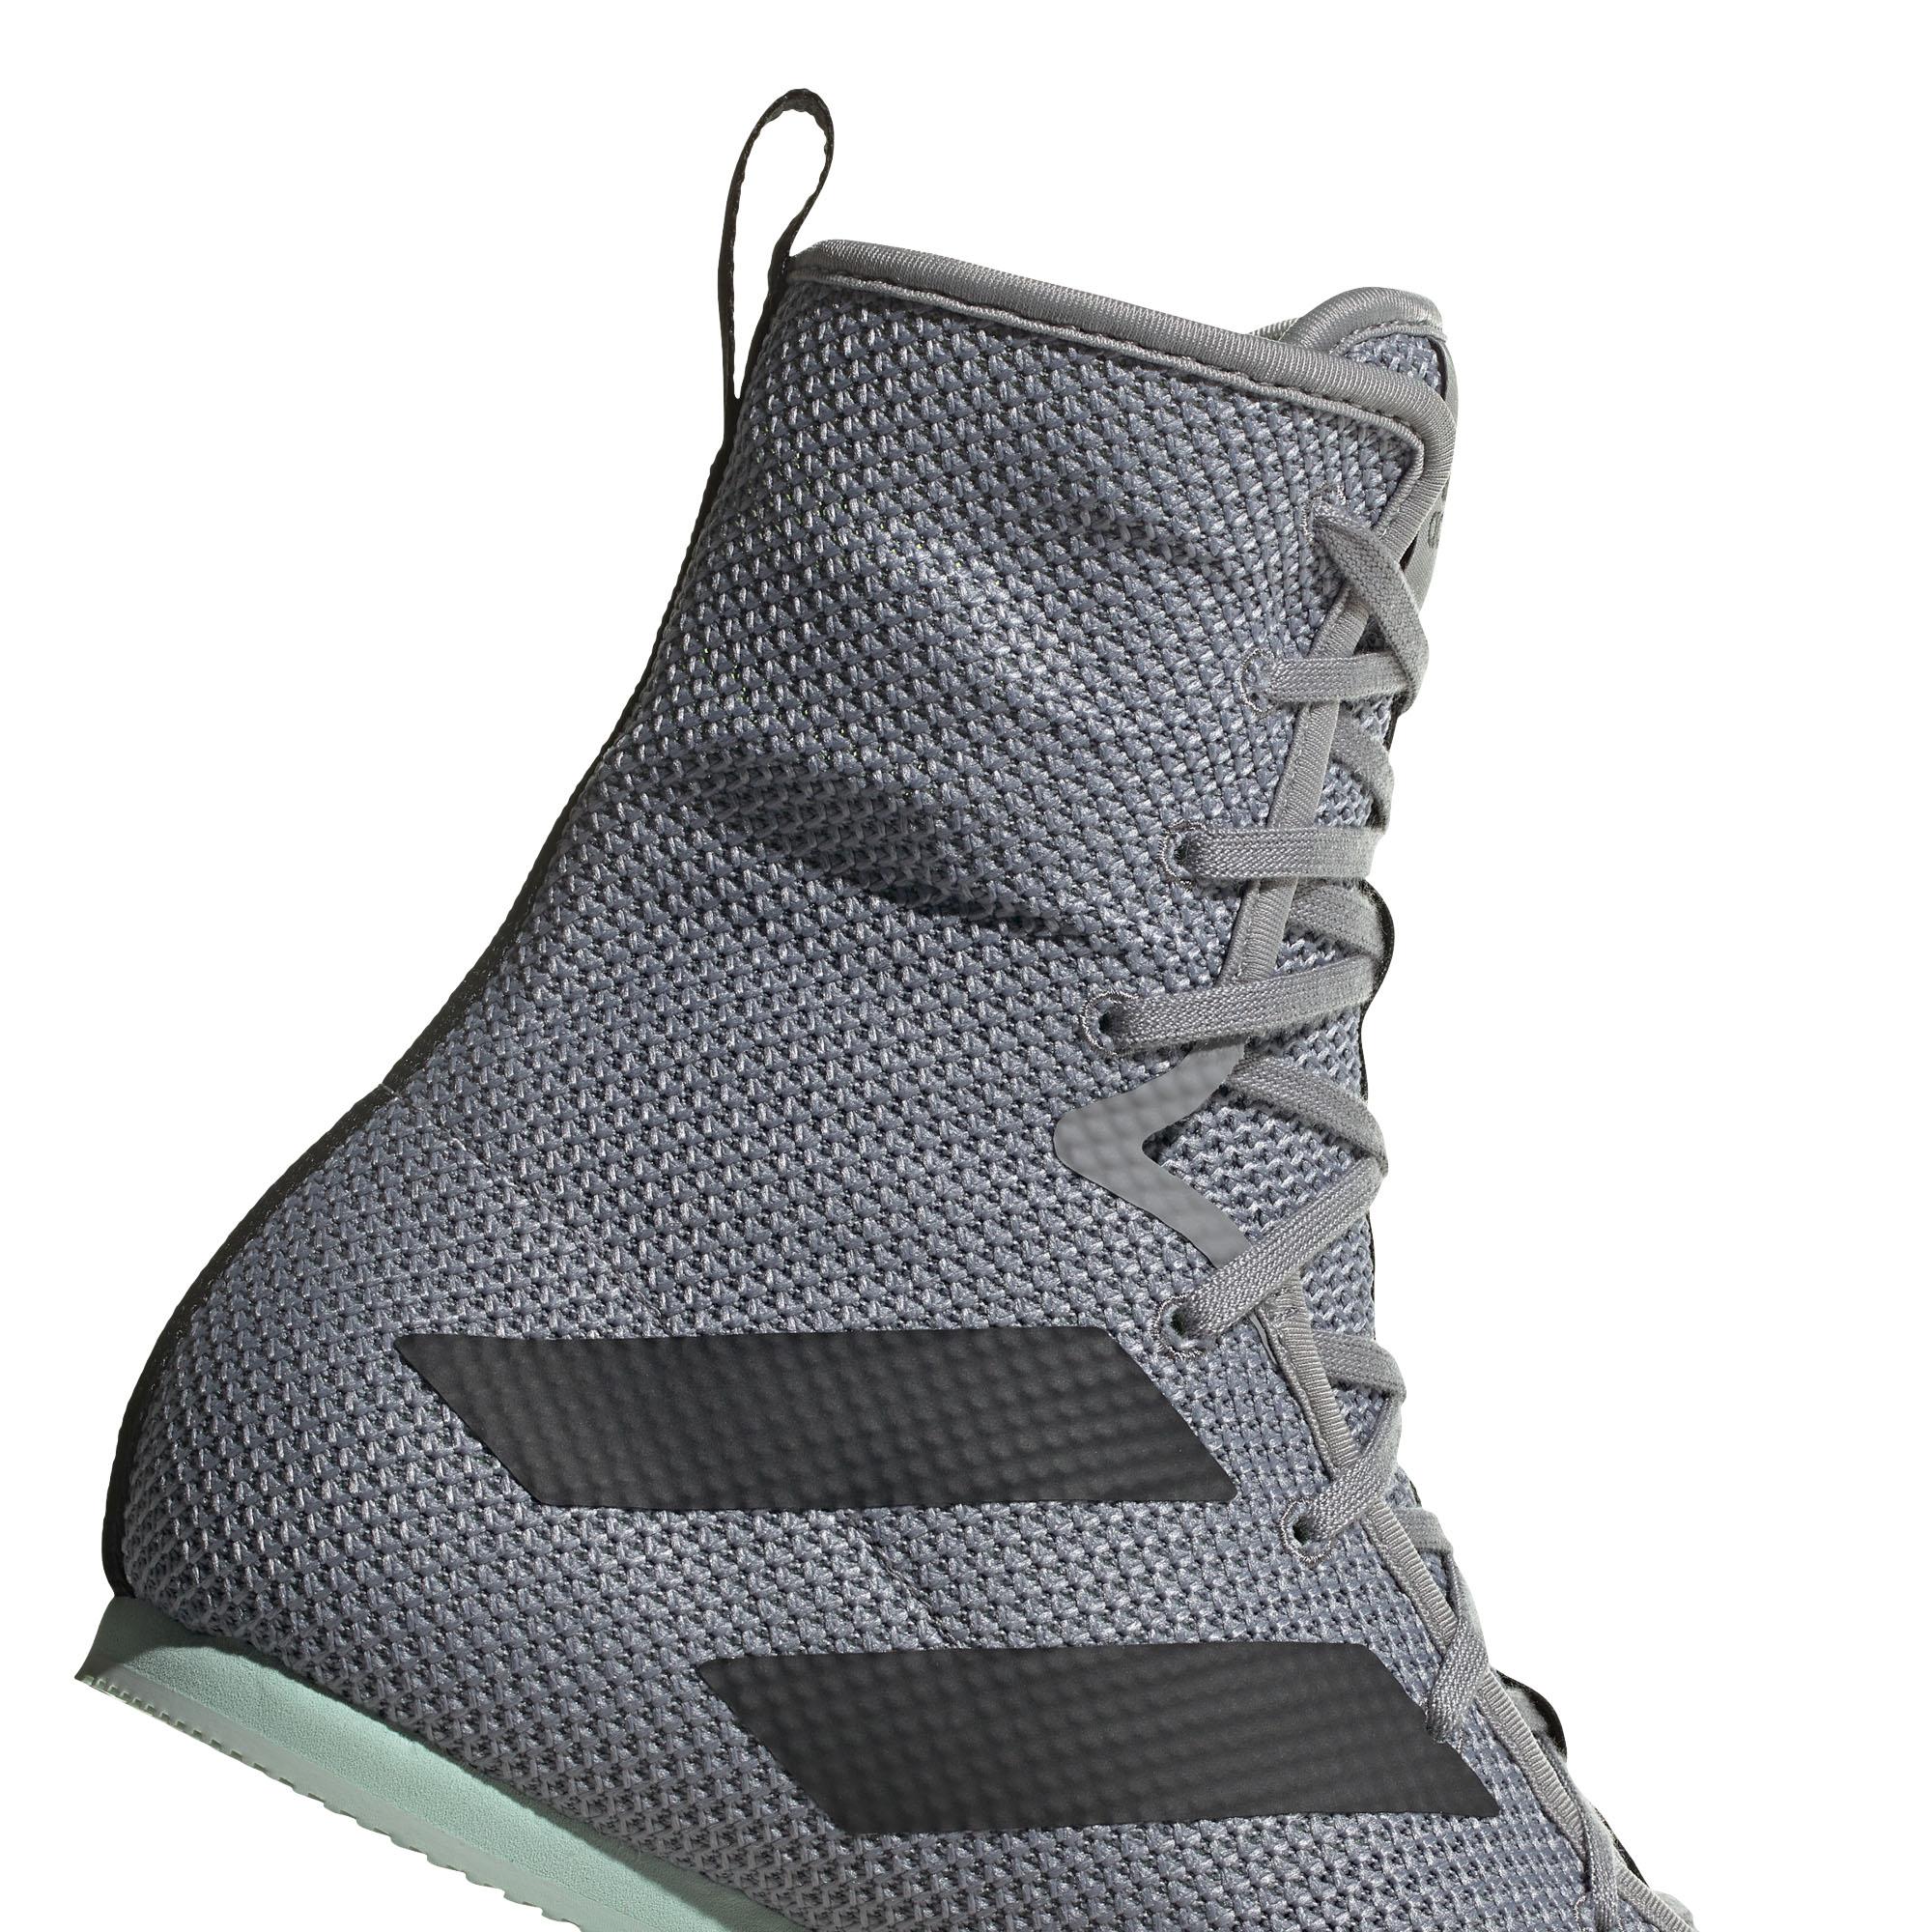 miniature 9 - Adidas Box Hog 3 boxe Trainer Shoe Boot gris/vert